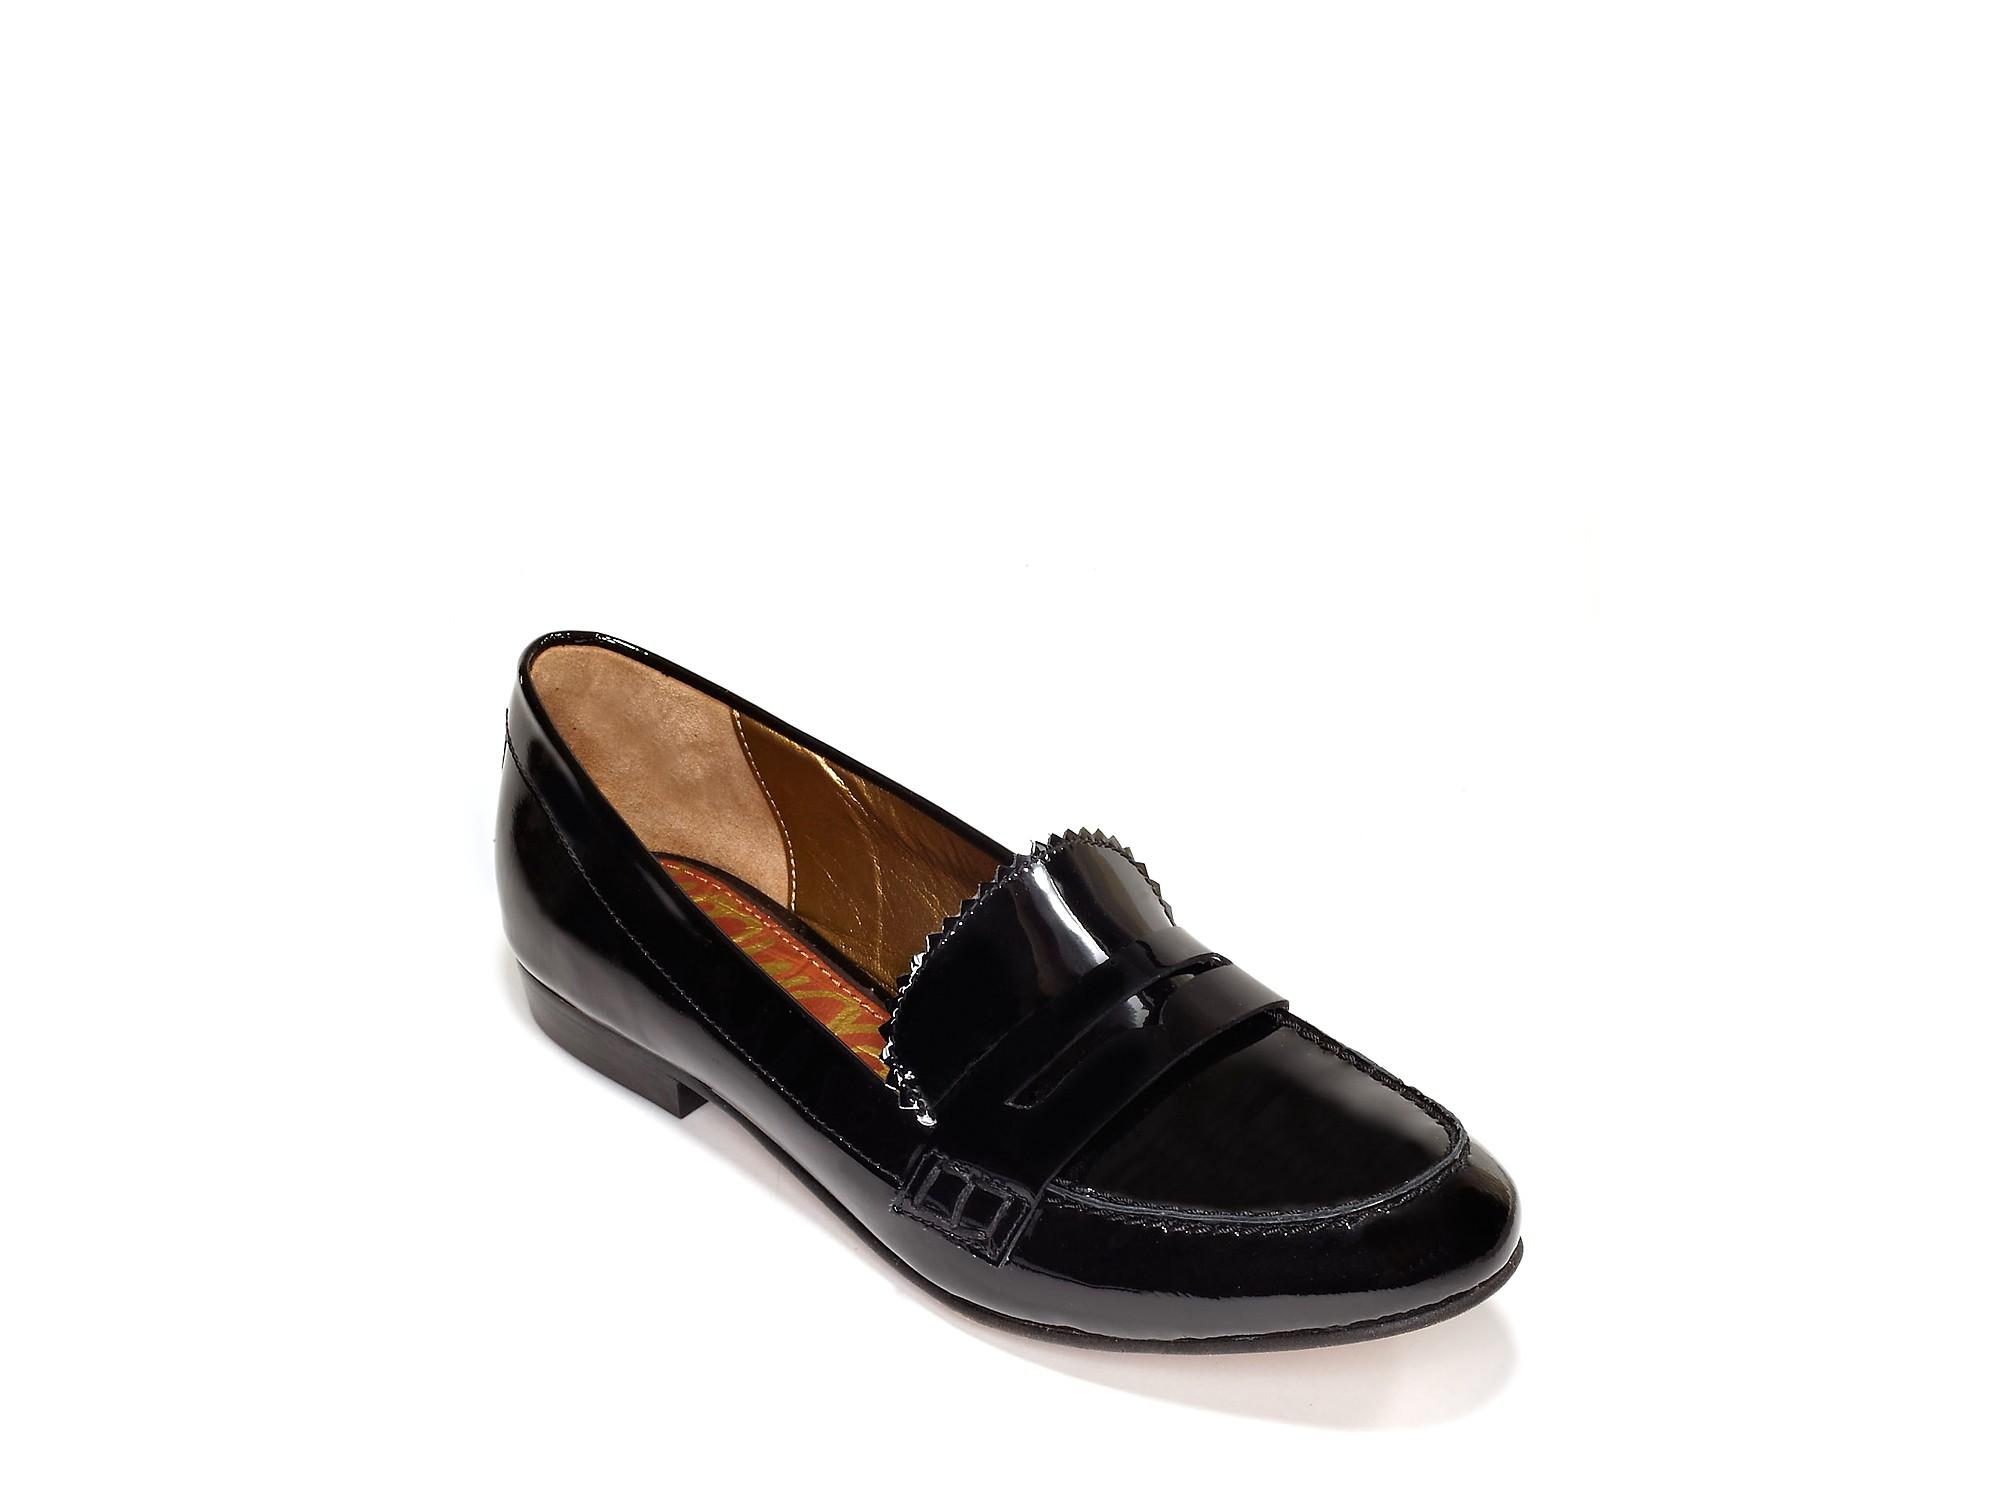 3f7ace26a07 Lyst - Sam Edelman Sam Edelman Etiene Penny Loafers in Black